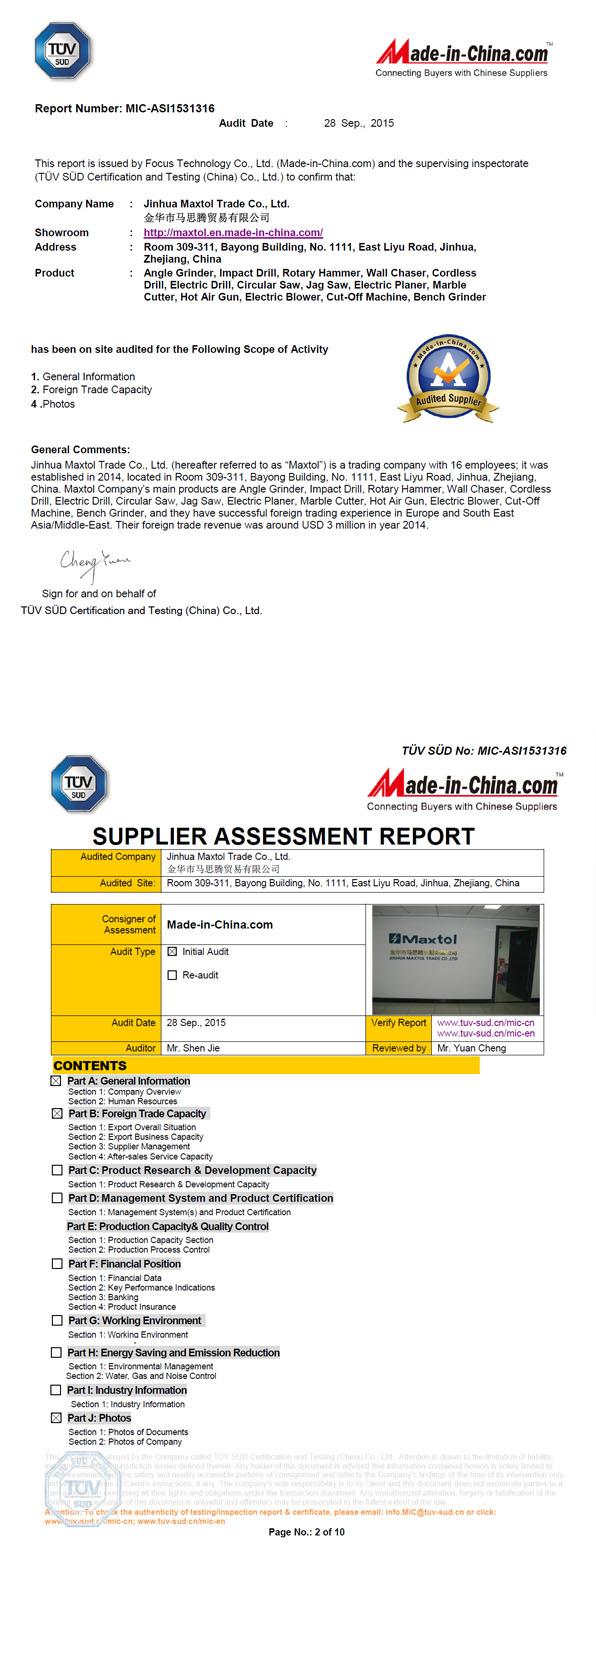 TUV SUD ASSESSMENT REPORT